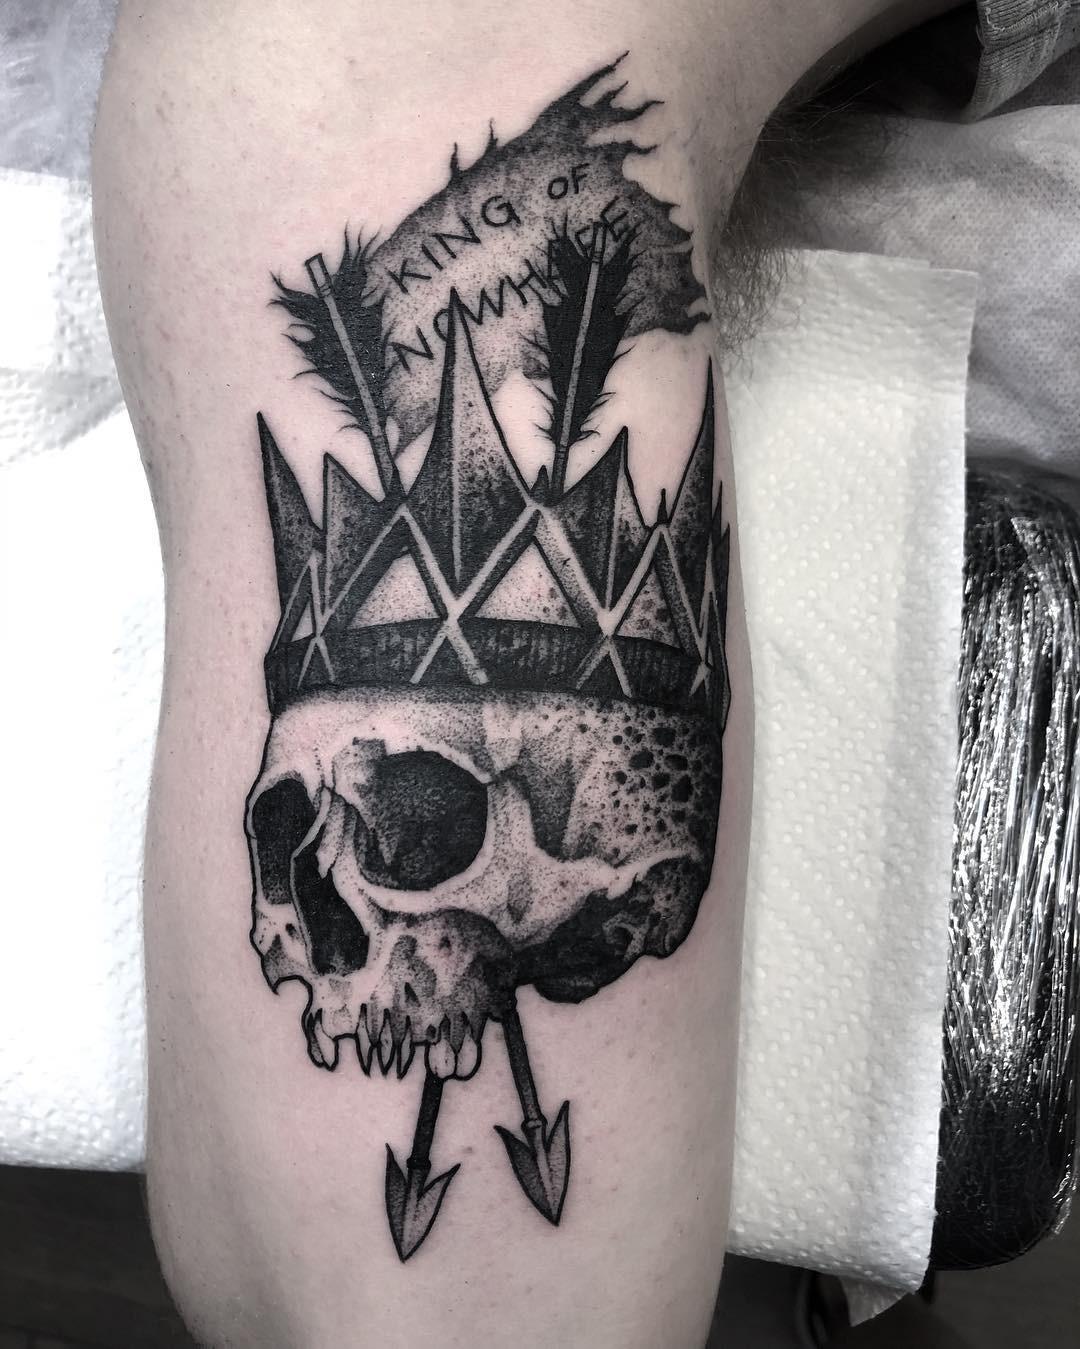 Patryk Chybowski (Boski Tattoo) inksearch tattoo